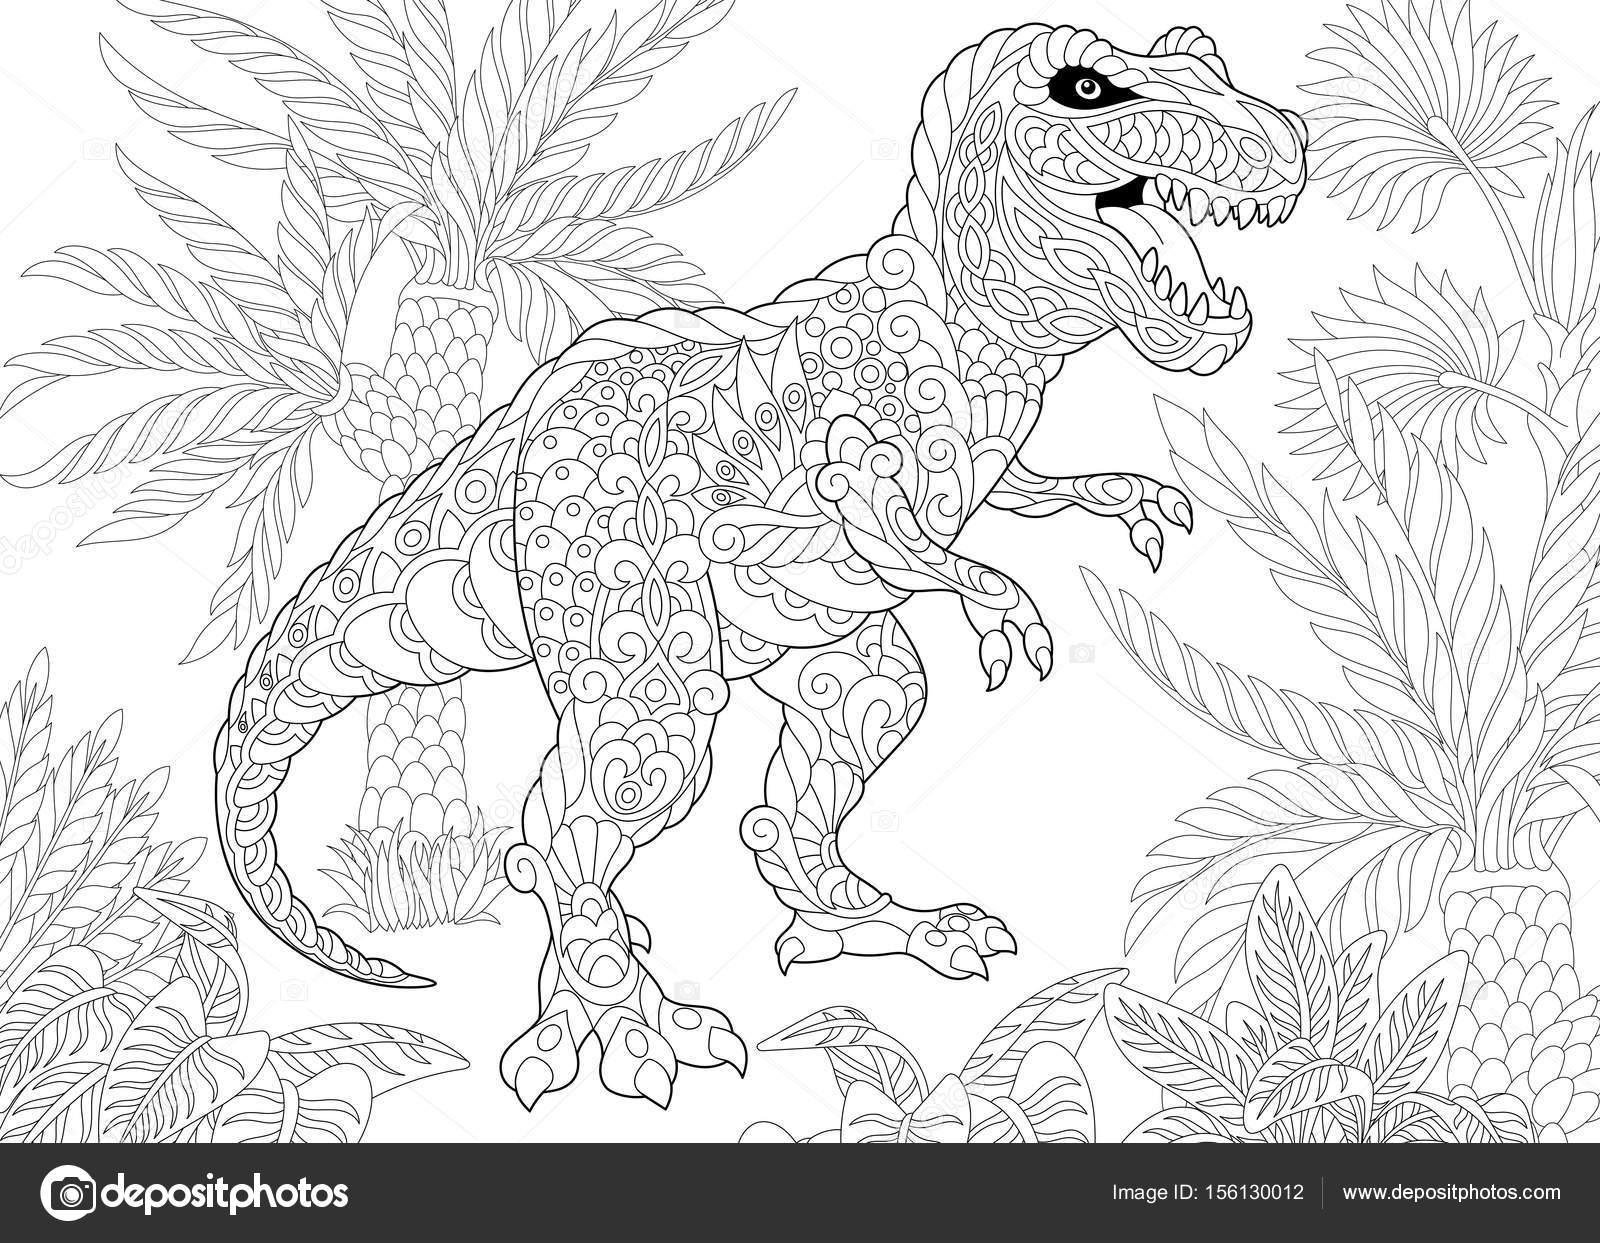 Coloriage Dinosaure Adulte.Dinosaure Tyrannosaure Zentangle Image Vectorielle Sybirko